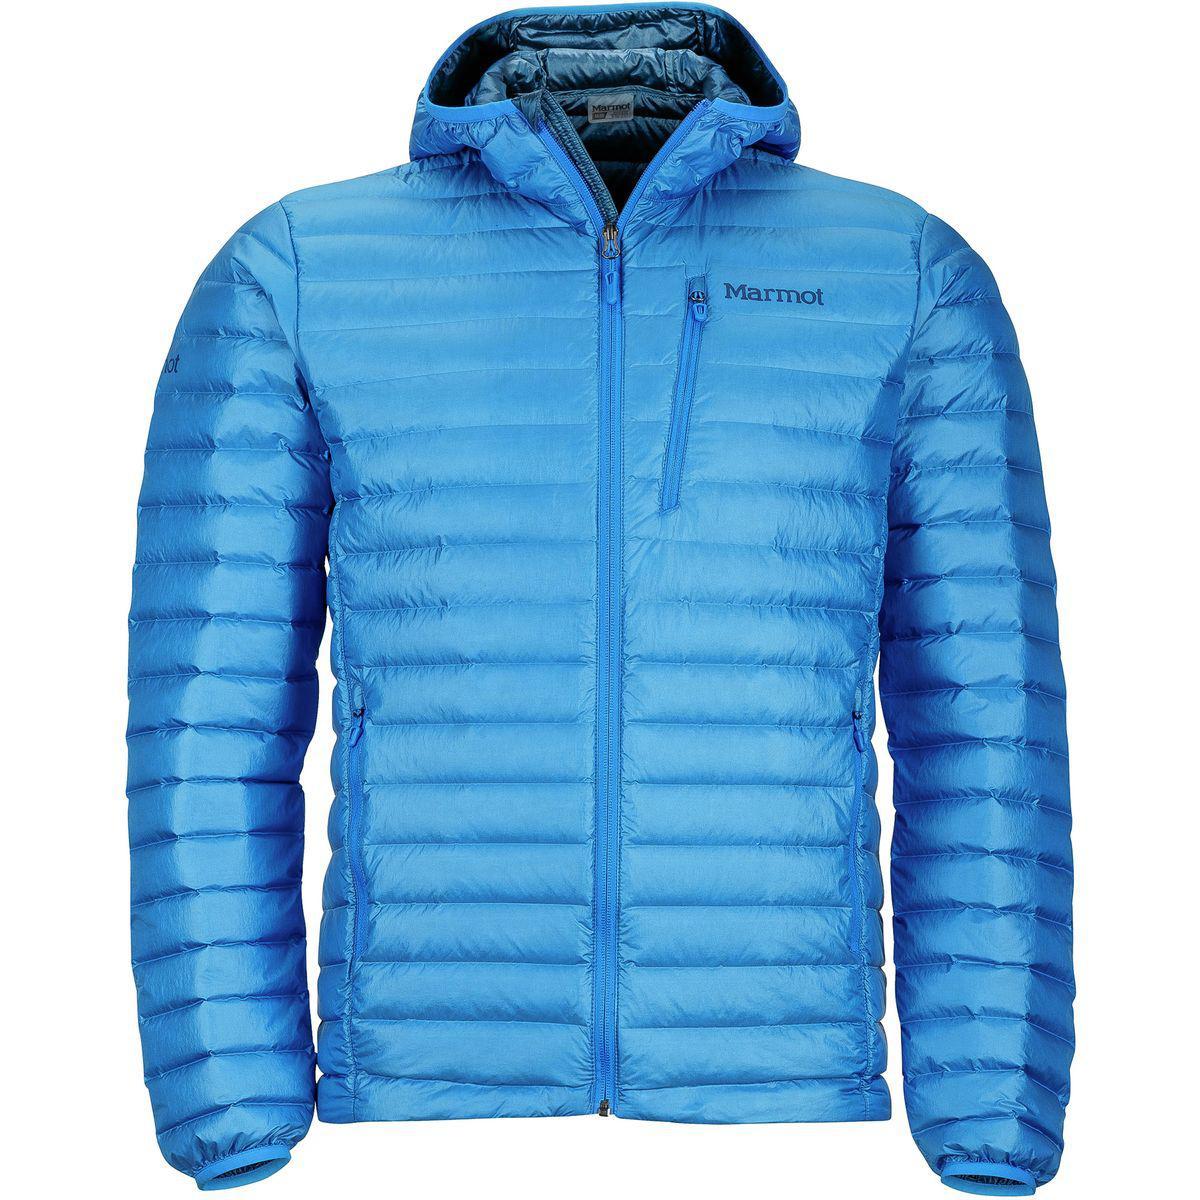 Lyst - Marmot Quasar Nova Hooded Down Jacket in Blue for Men 3d84ab0ee8a6